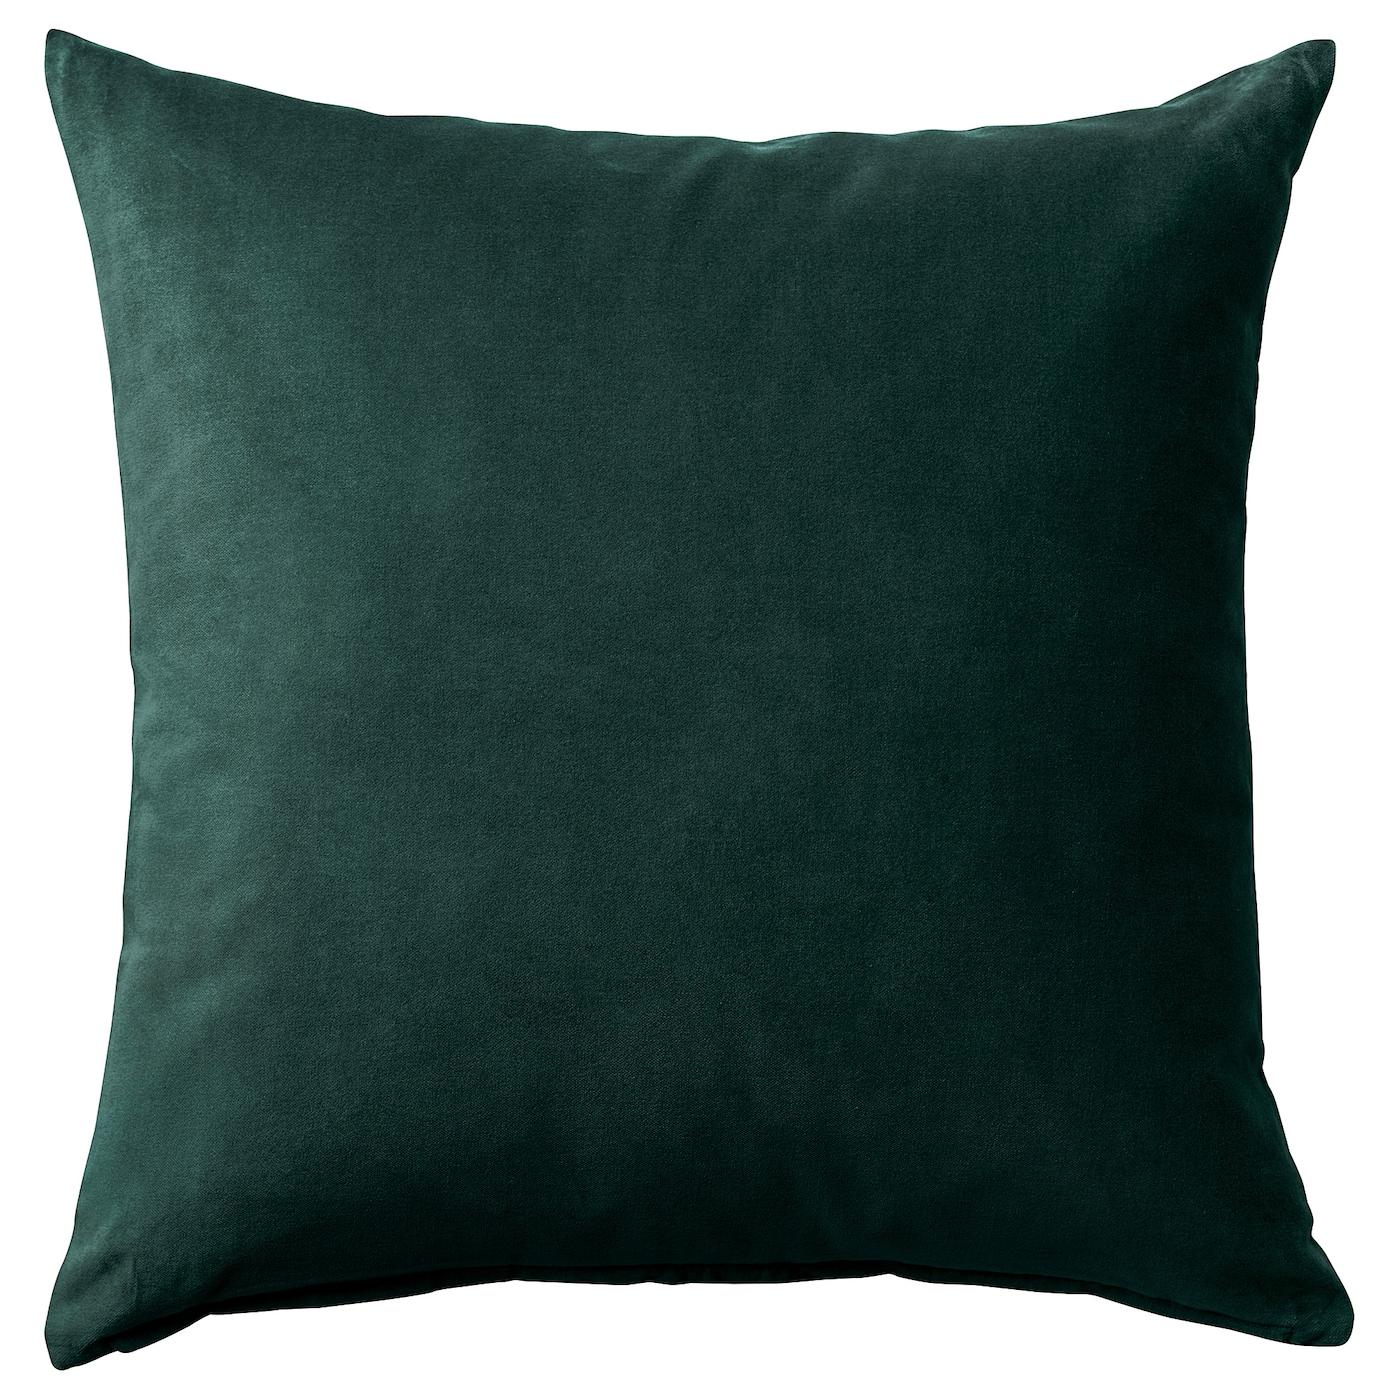 Shop SANELA Cushion cover, dark green from Ikea on Openhaus